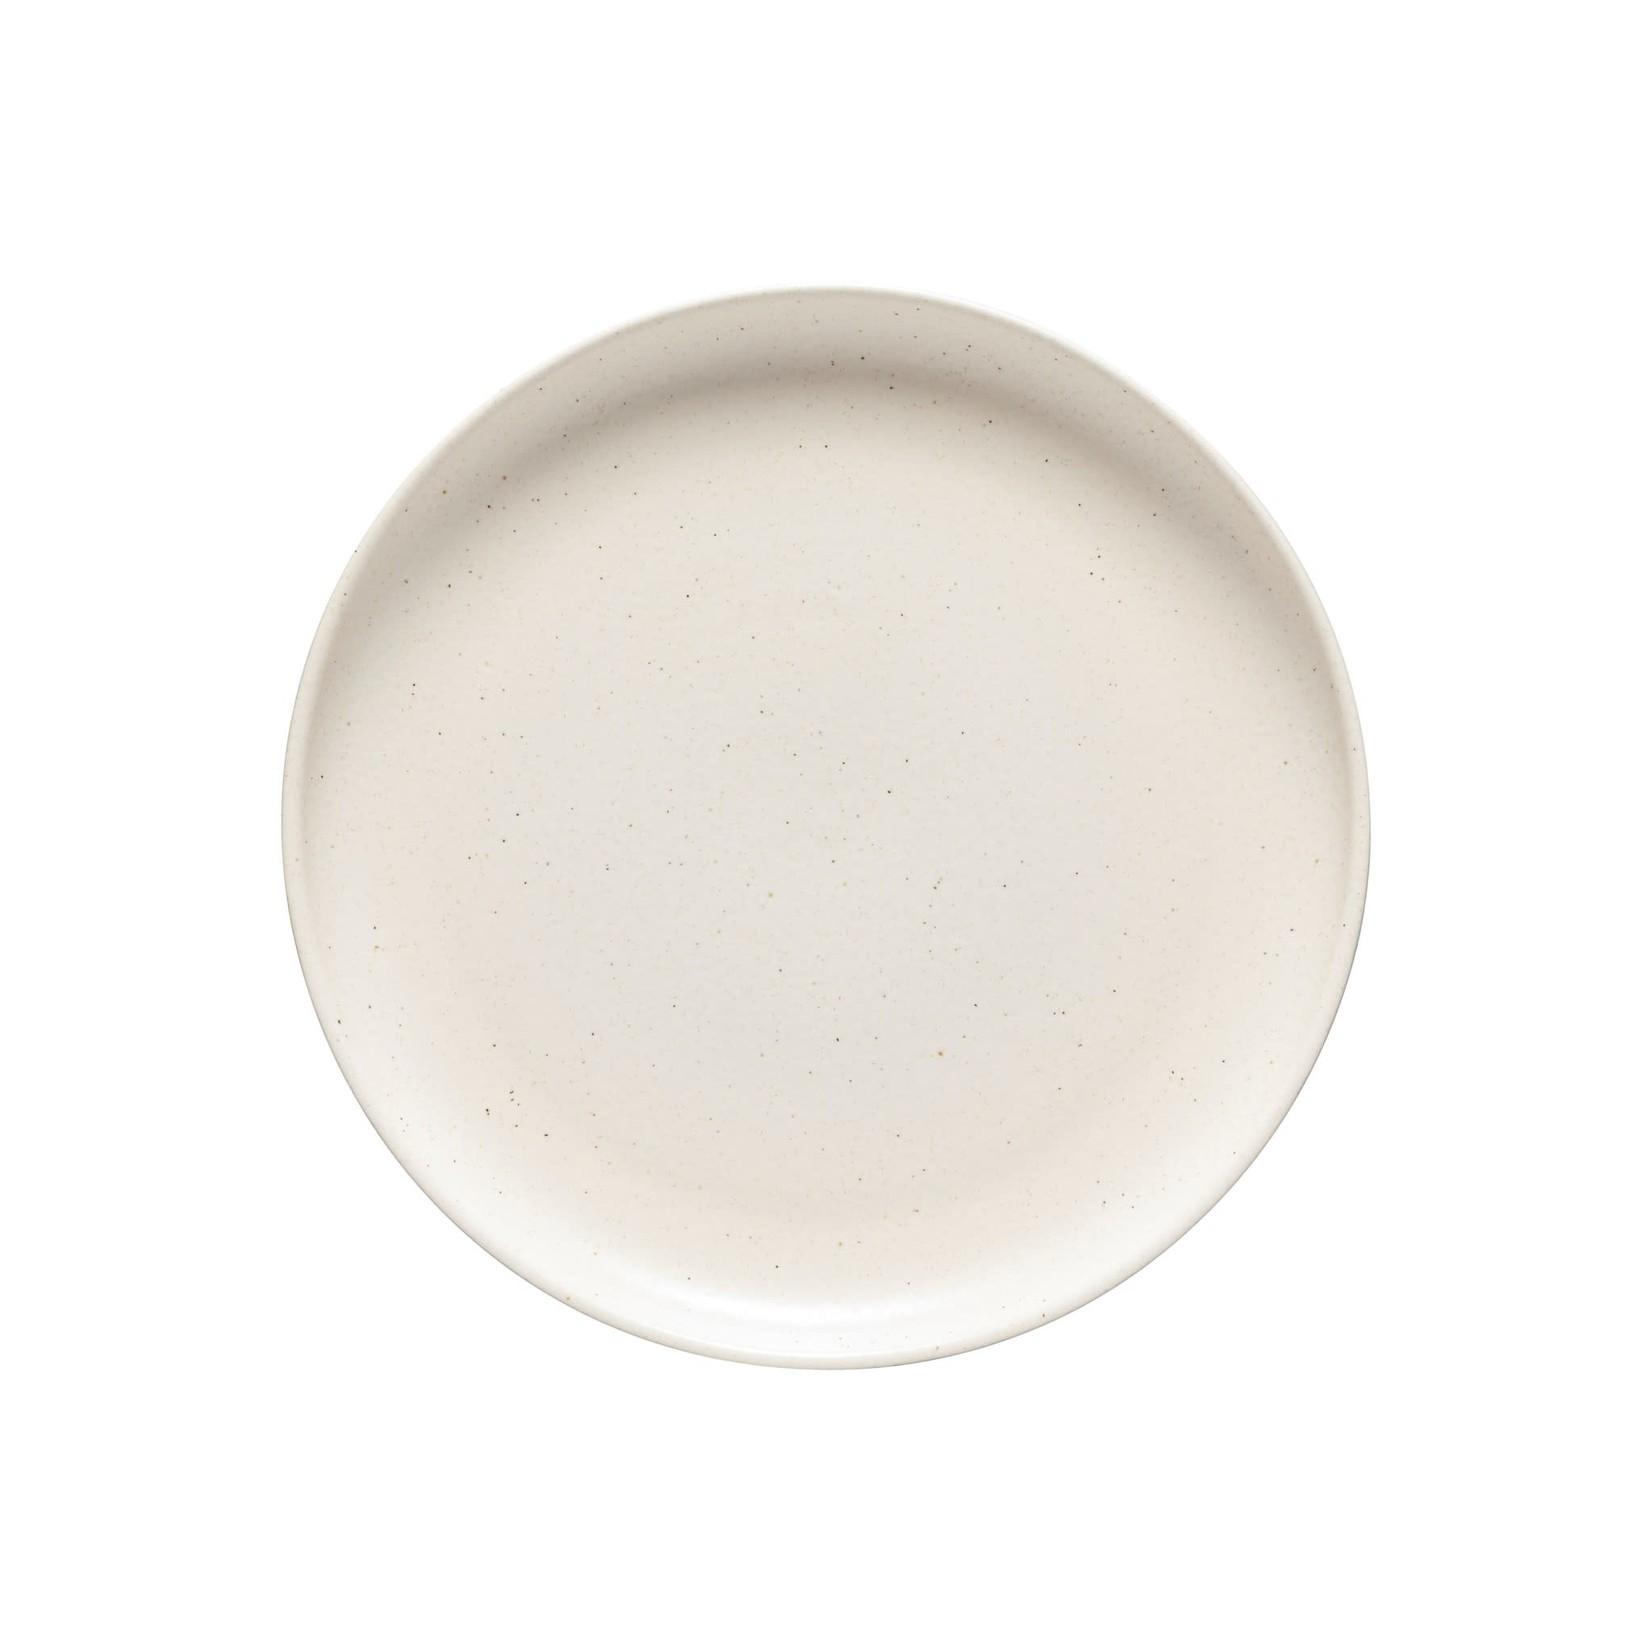 Pacifica Vanilla Dinner plate